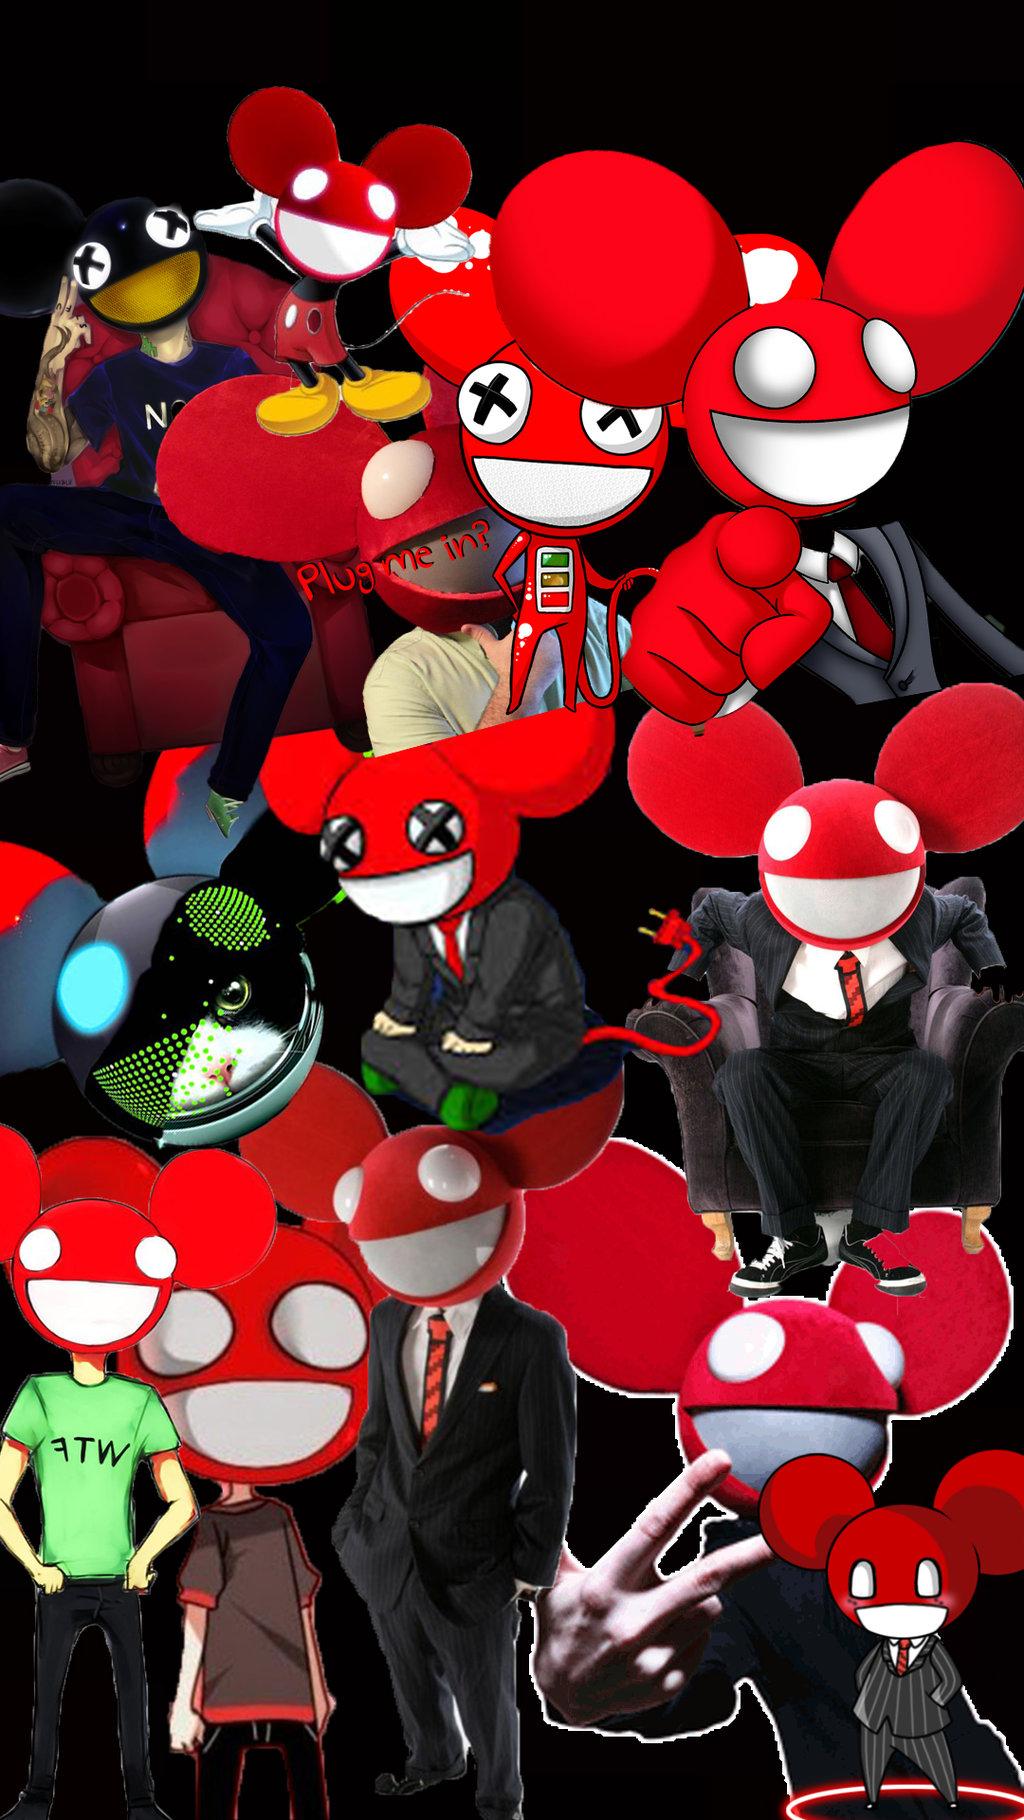 Deadmau5 phone wallpaper by MasterOfCheetahz 1024x1820